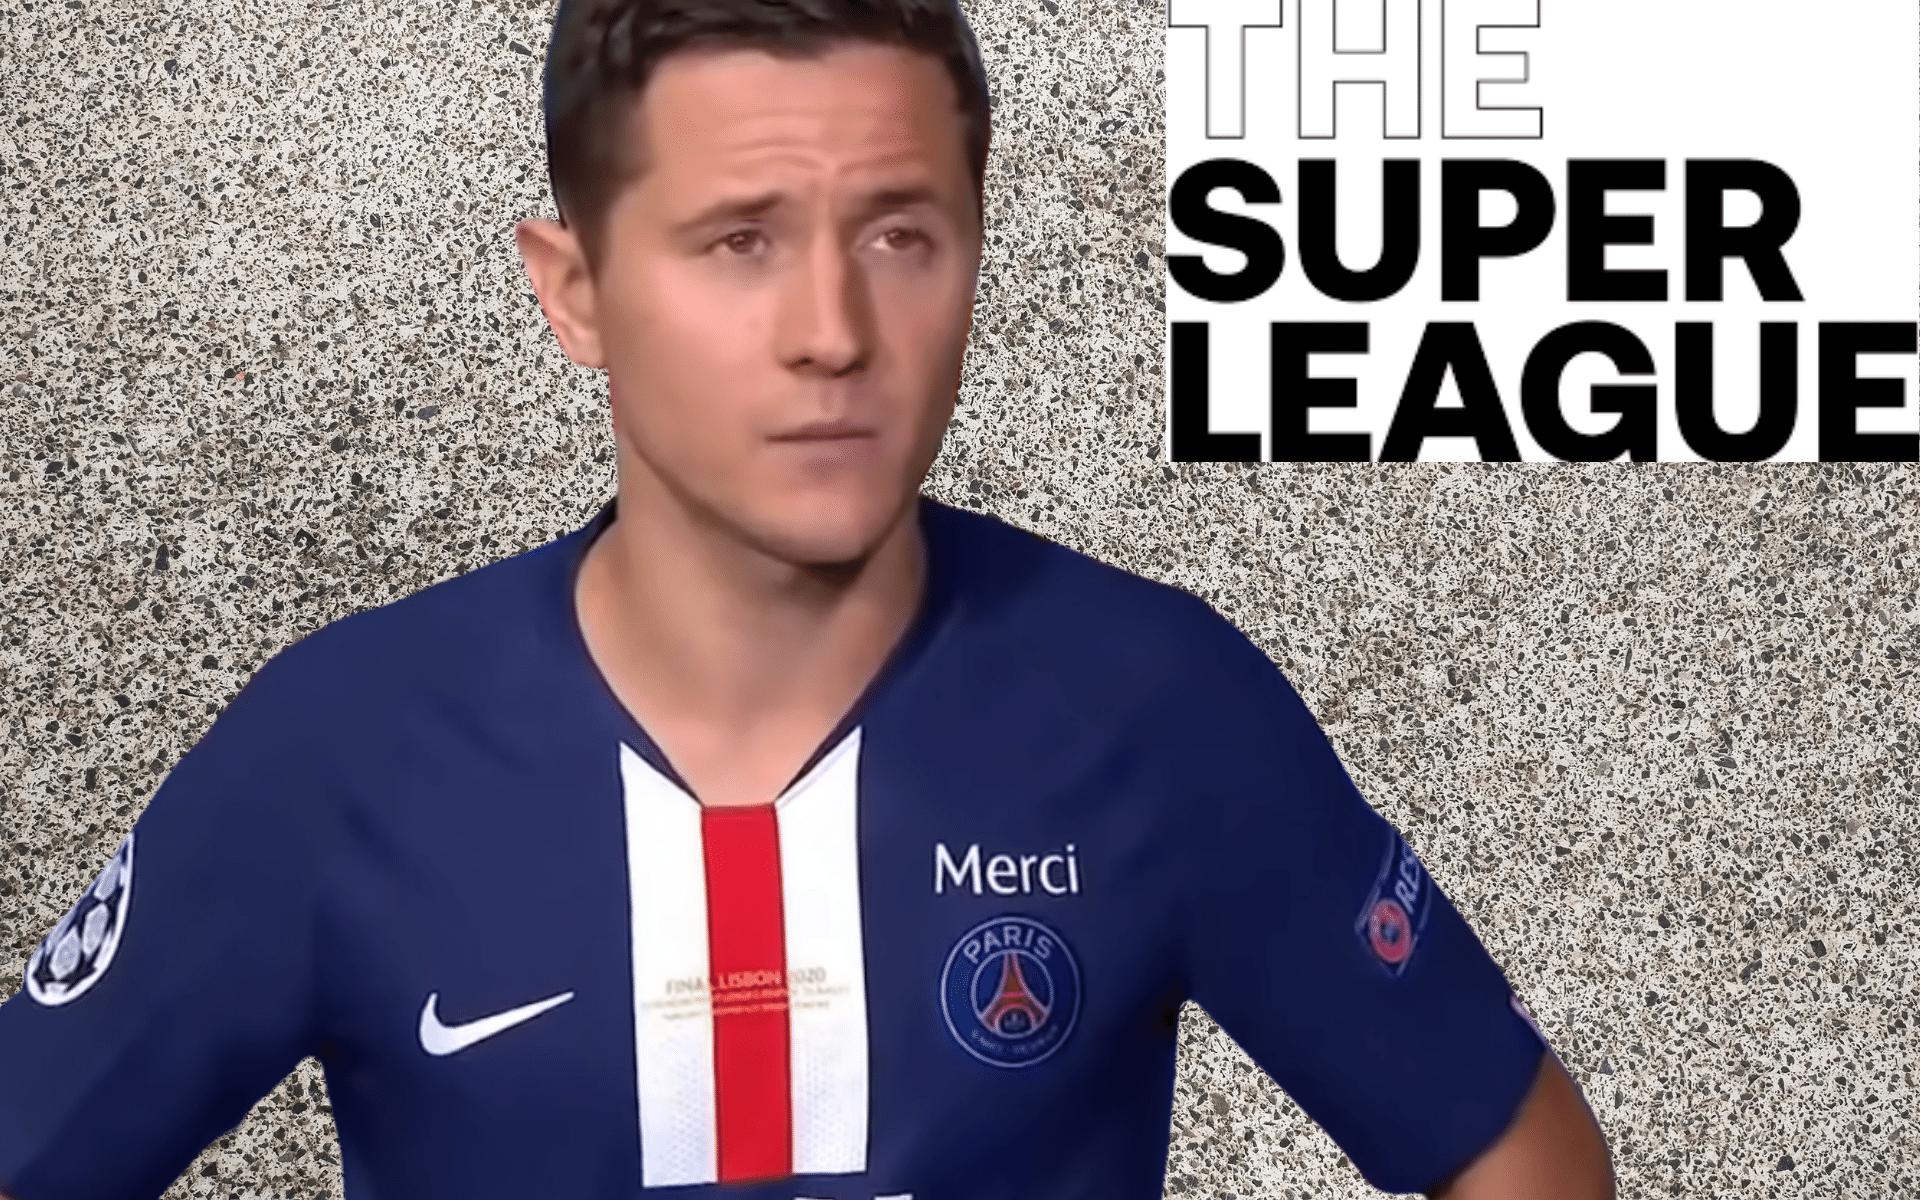 Super League Hypocrisy